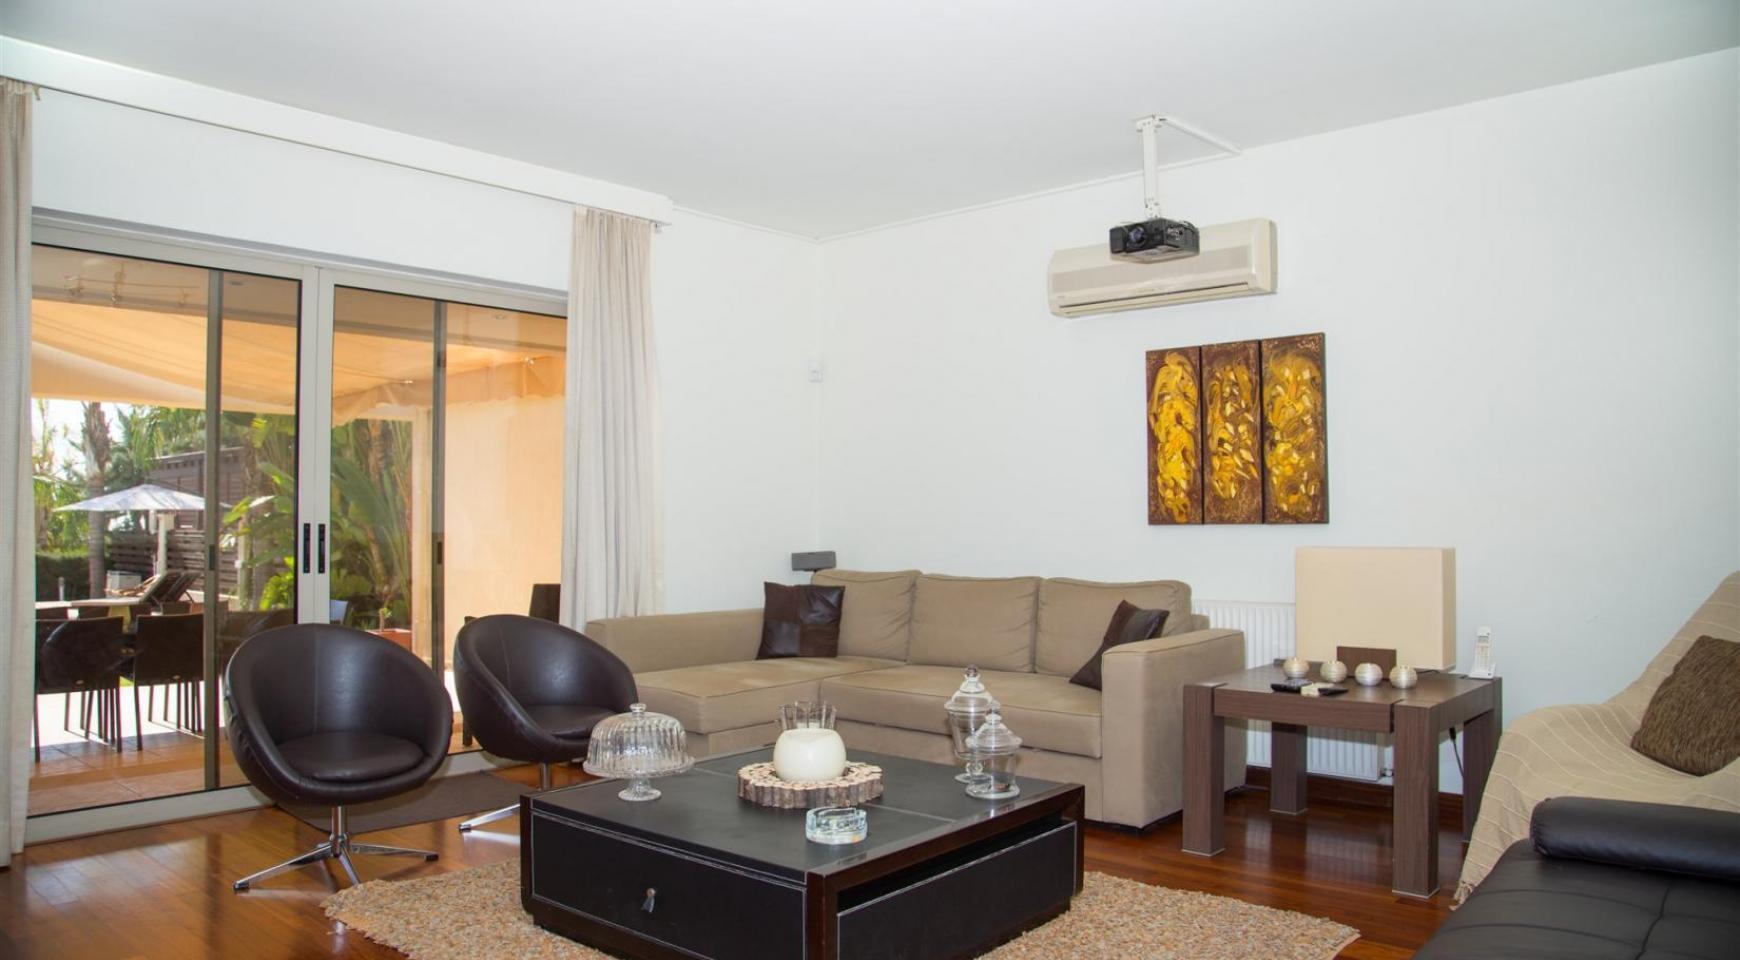 Modern Luxury 4 Bedroom Villa in Sfalagiotisa, Agios Athanasios - 20